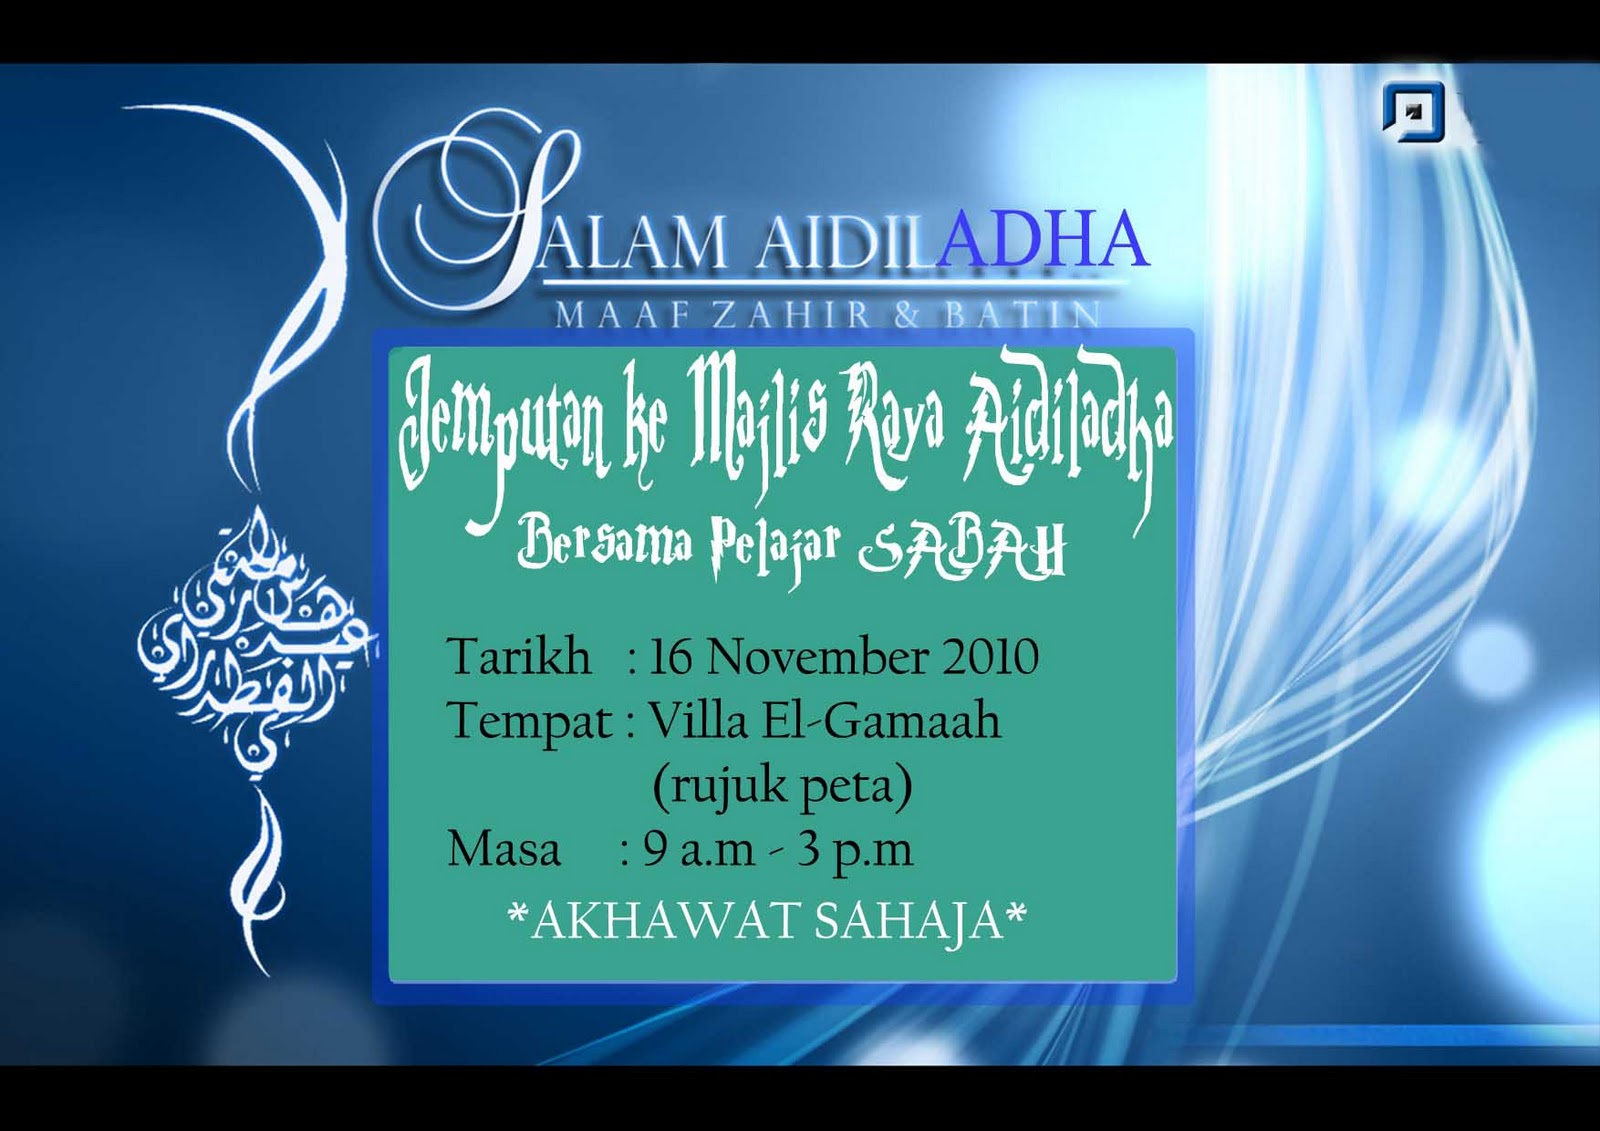 Hari raya open house invitation card template invitationjpg rayaopenhouse on feedyeti com hari raya 2017 stopboris Images